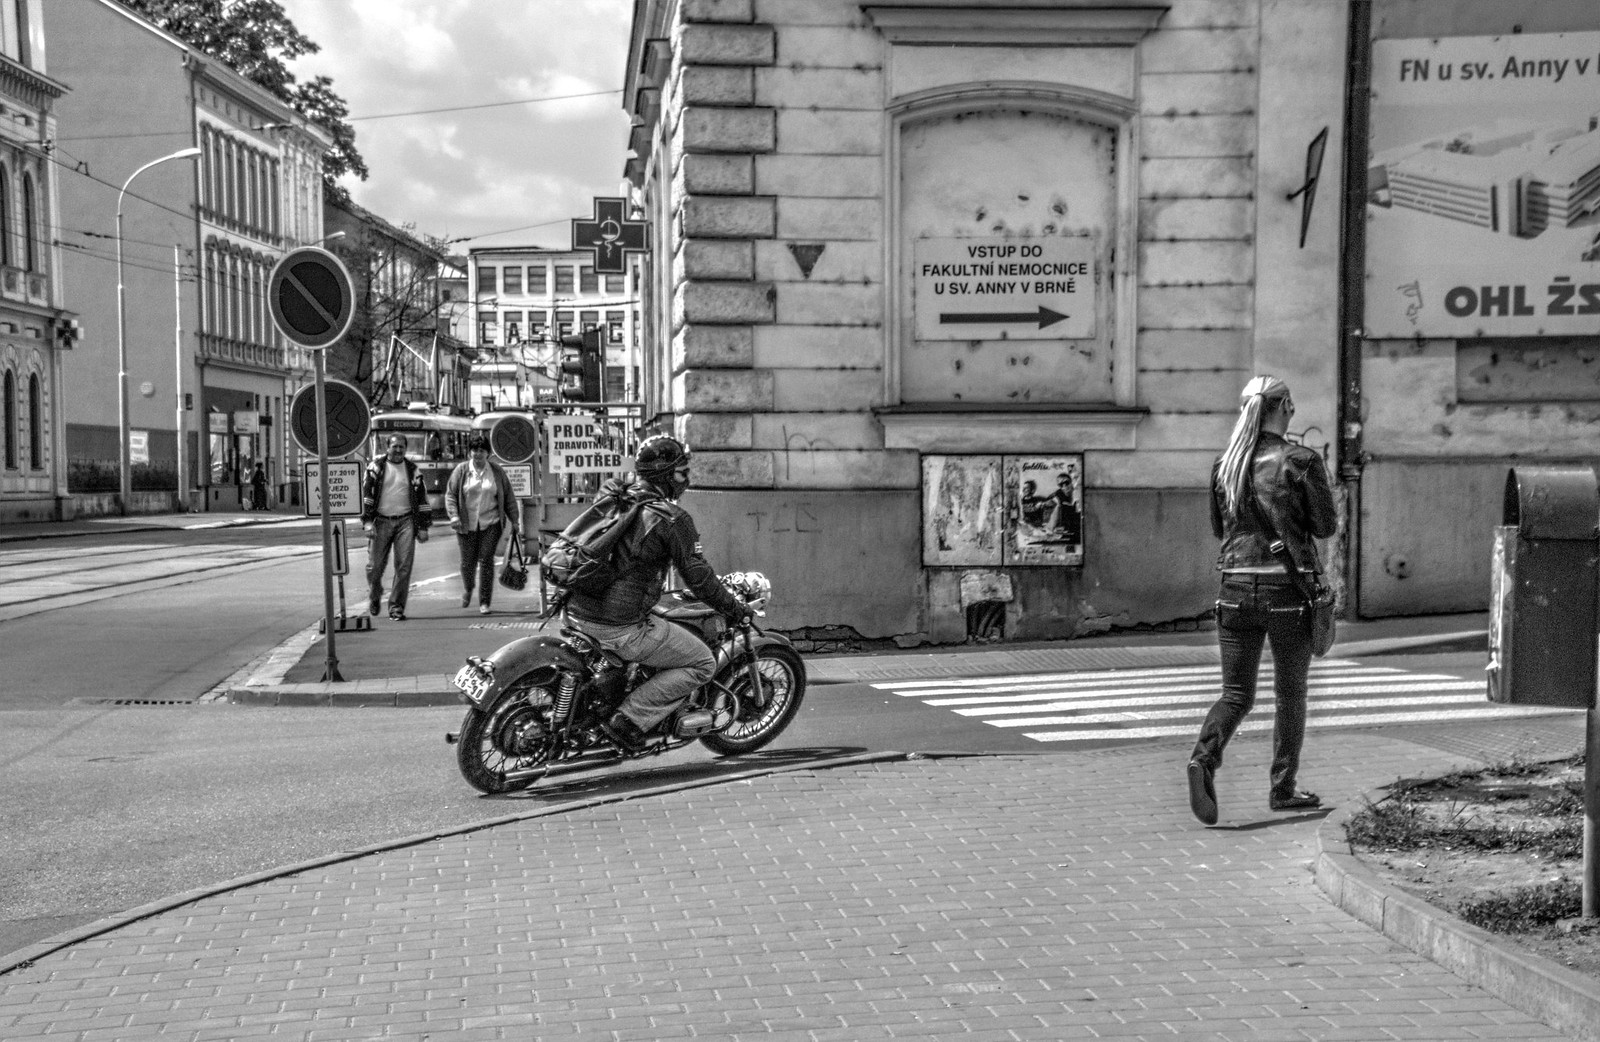 Street Scene with Retro Biker